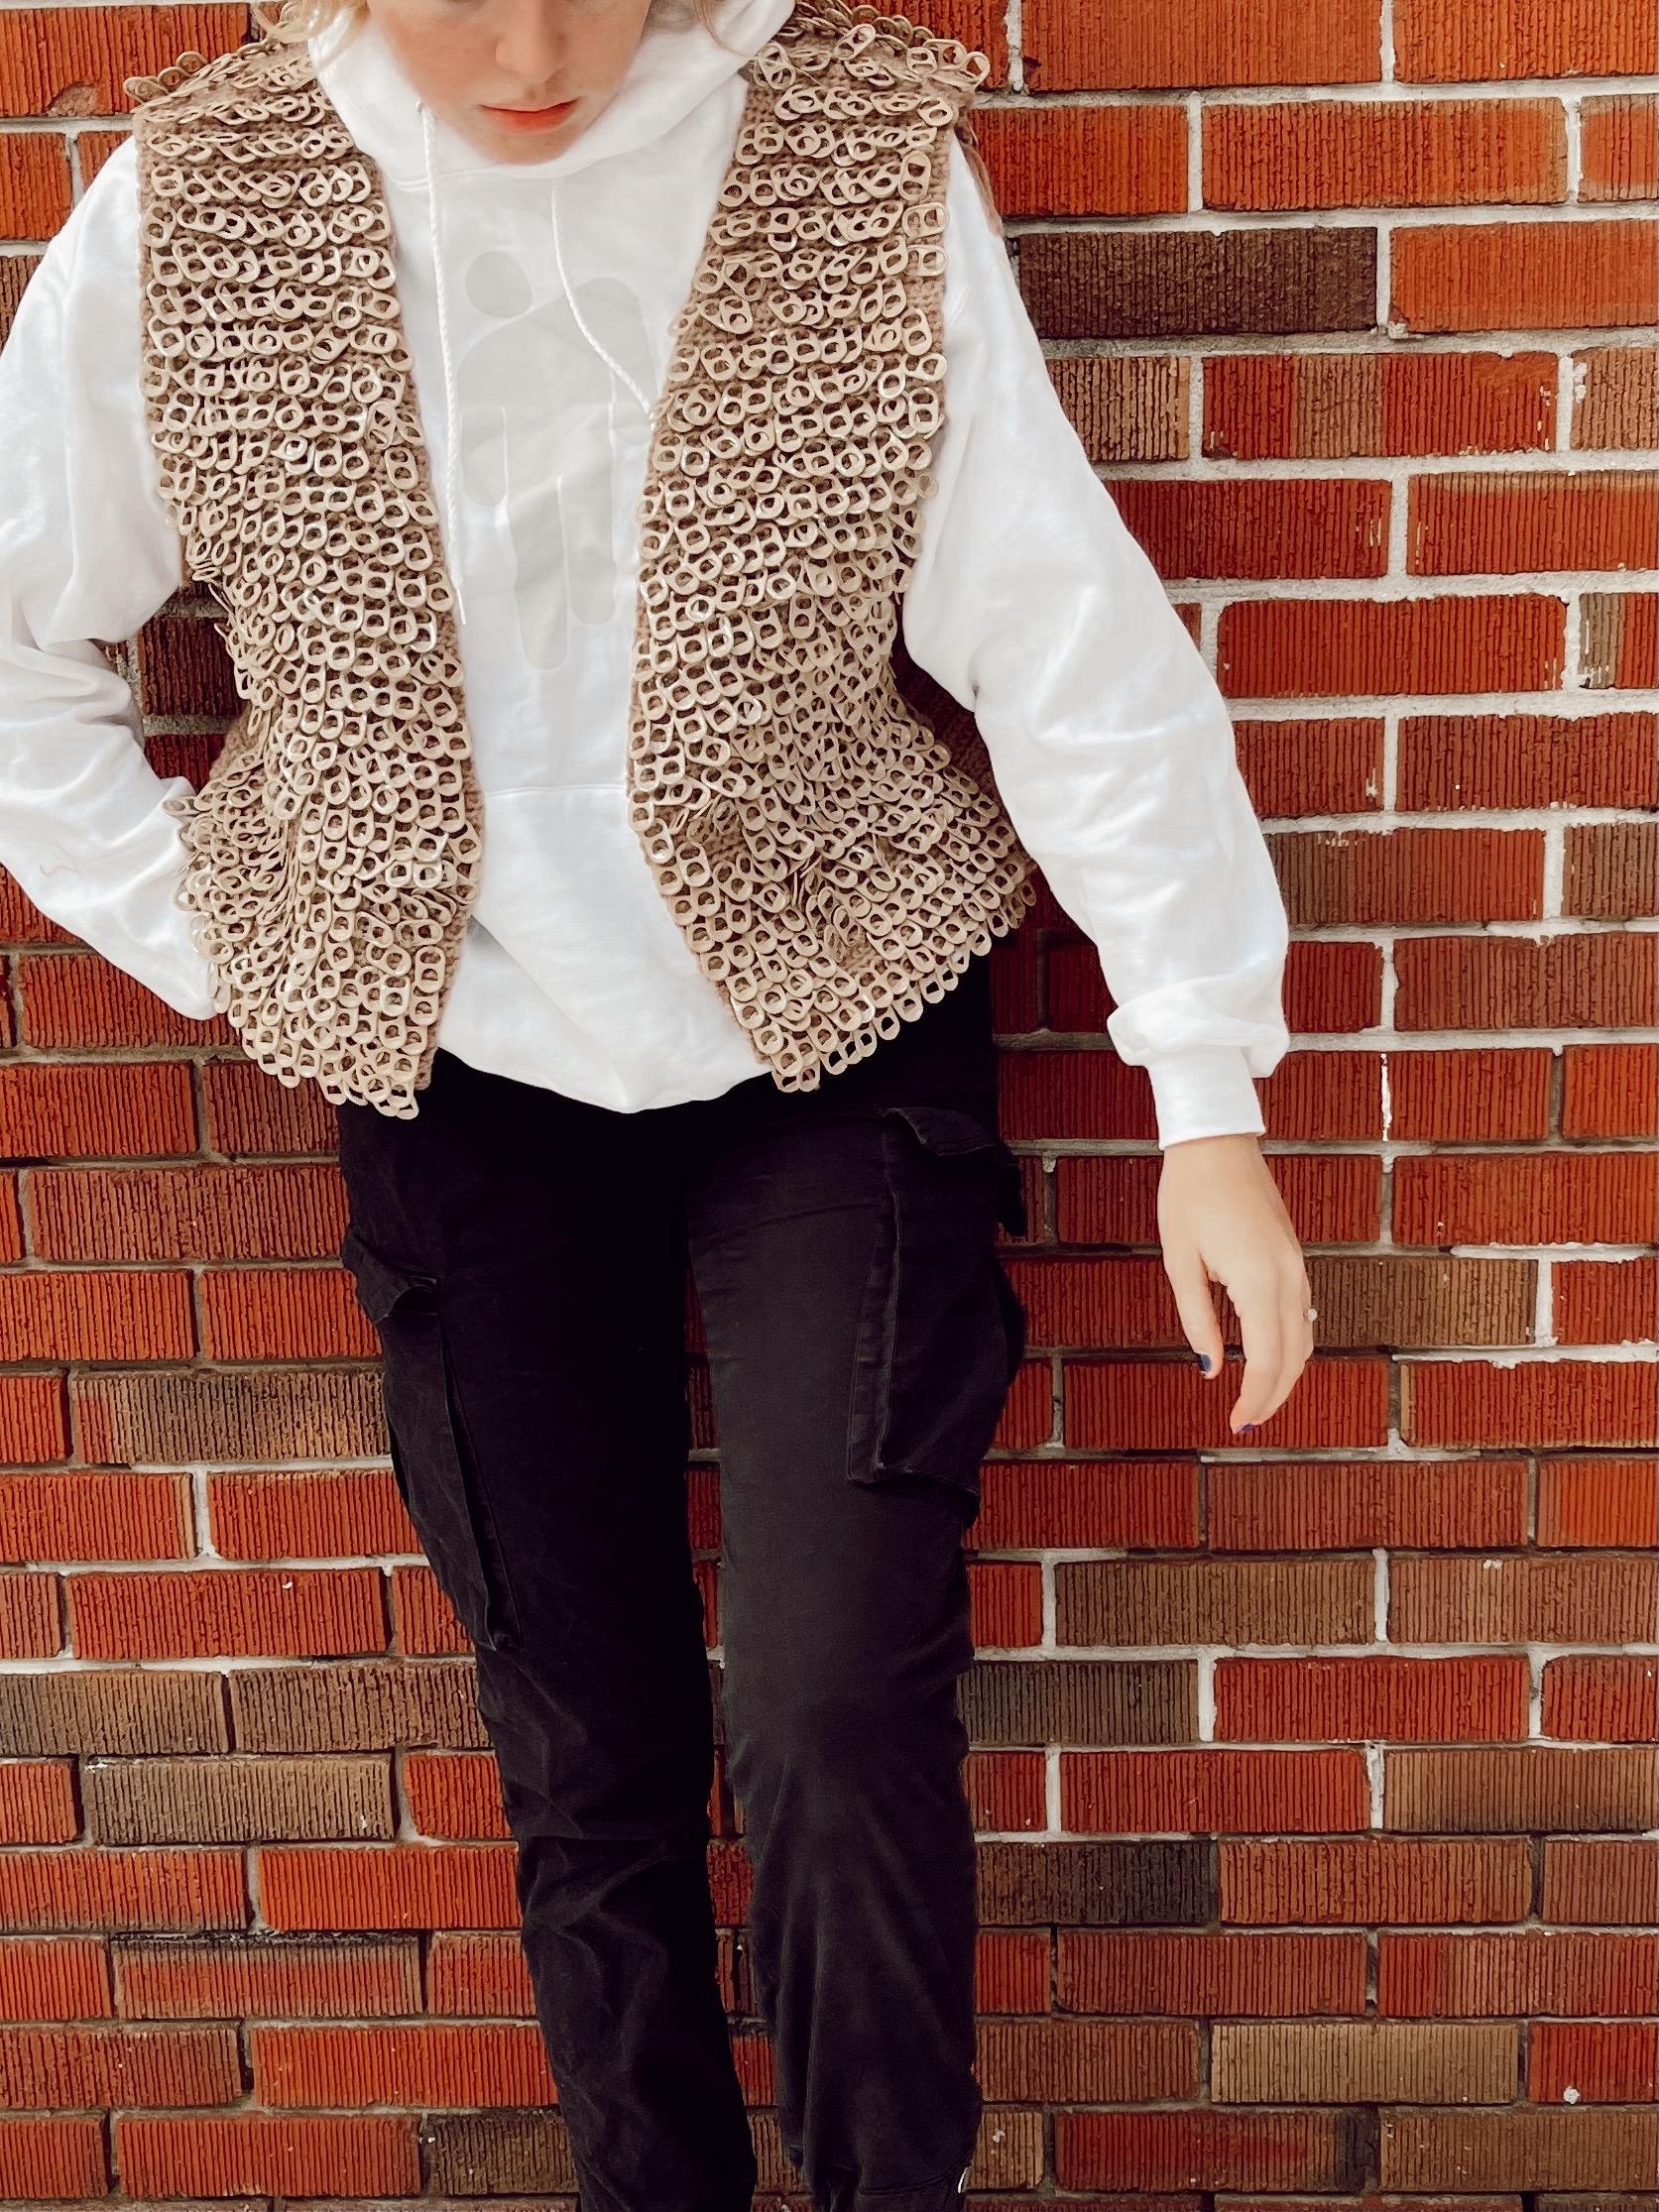 Modelling the pop tab vest